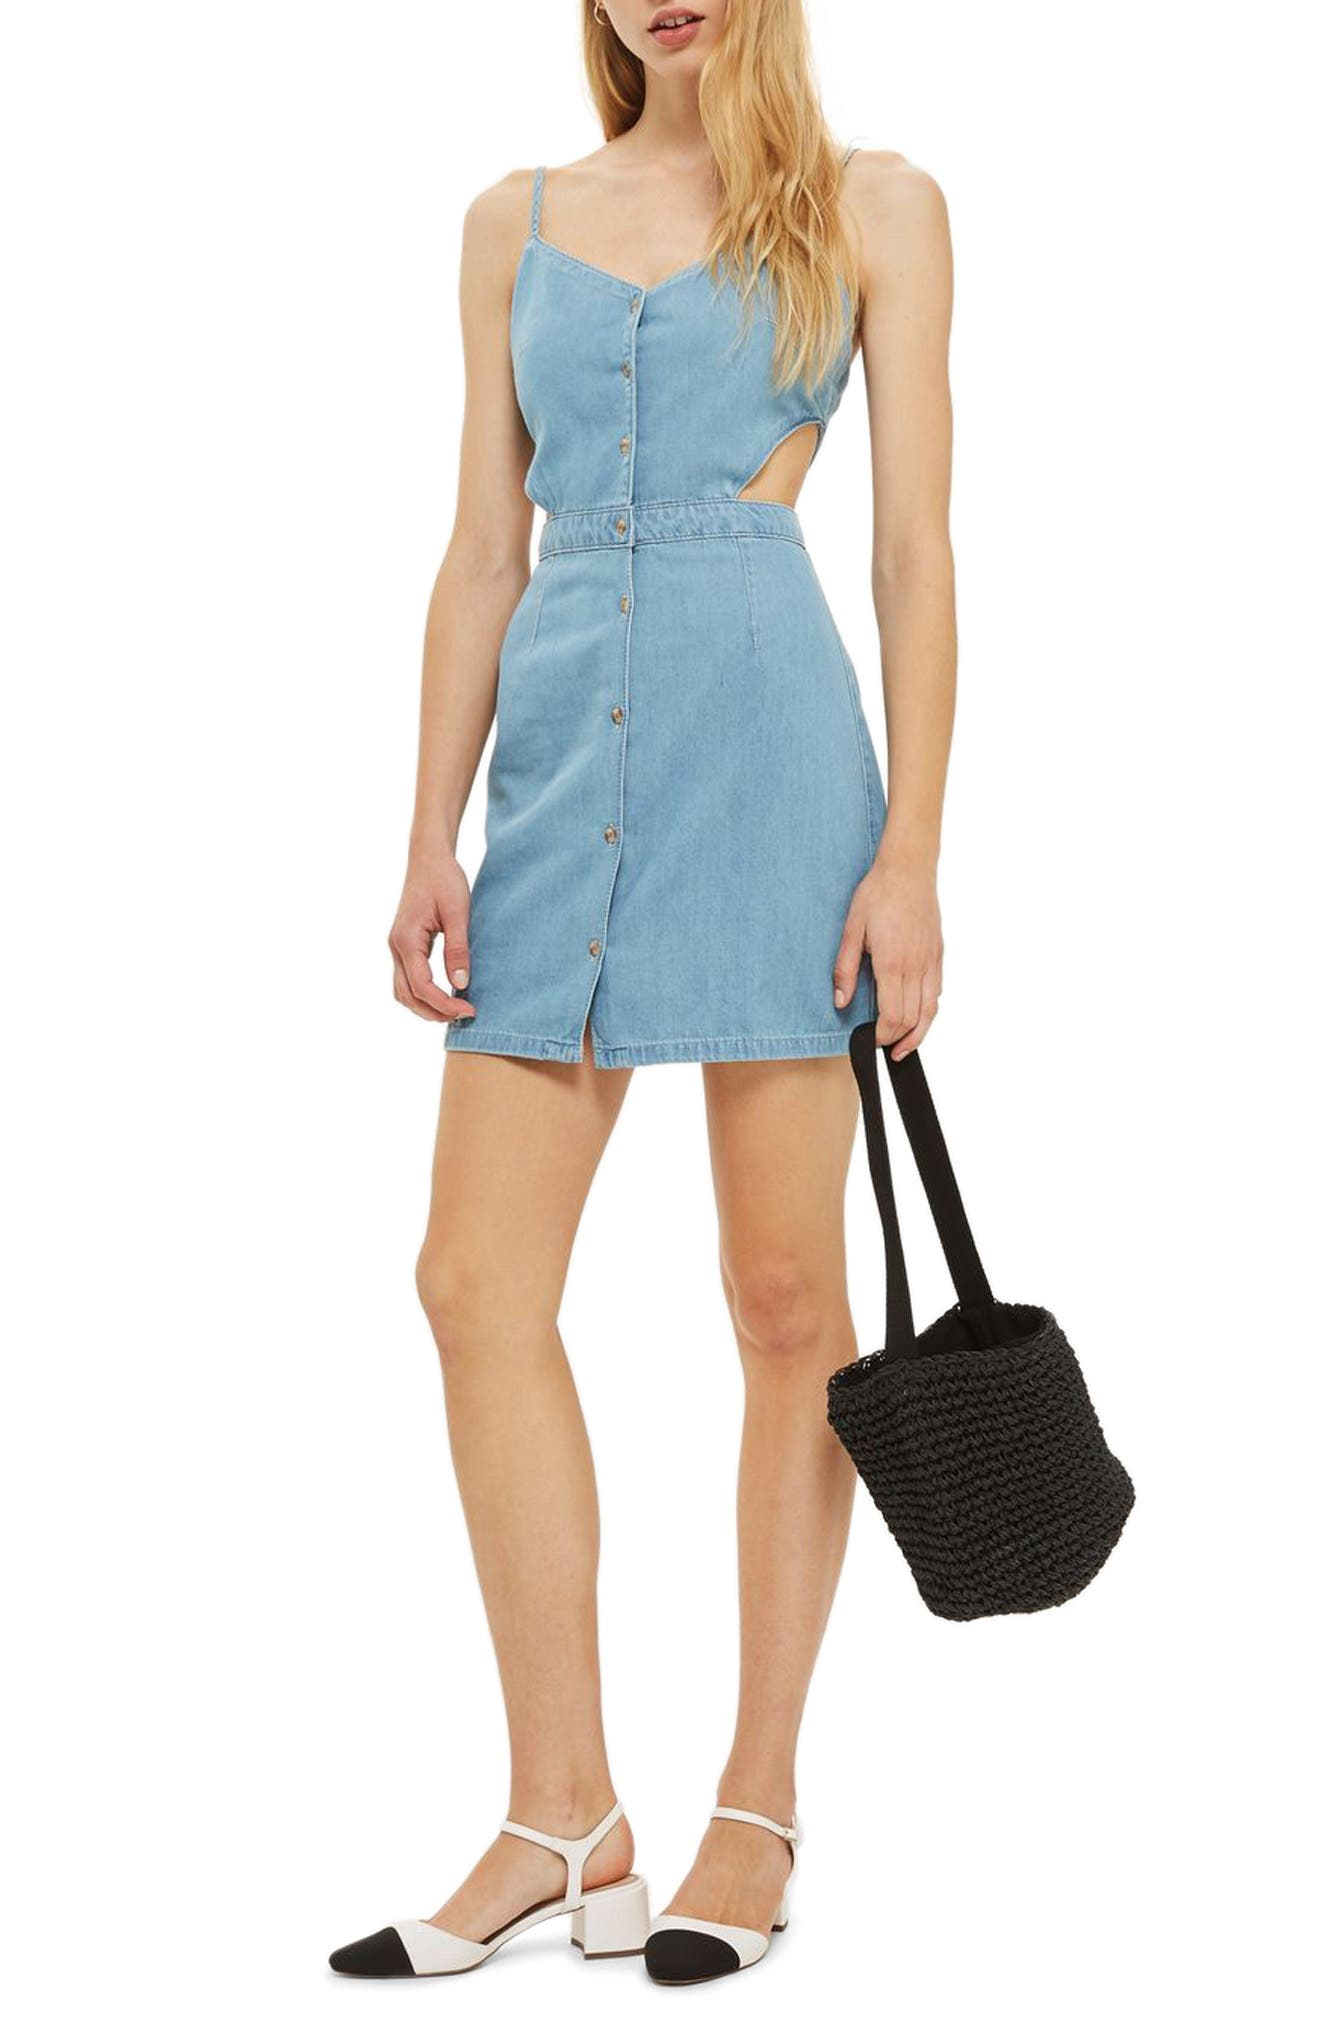 Topshop Cutout Denim Dress